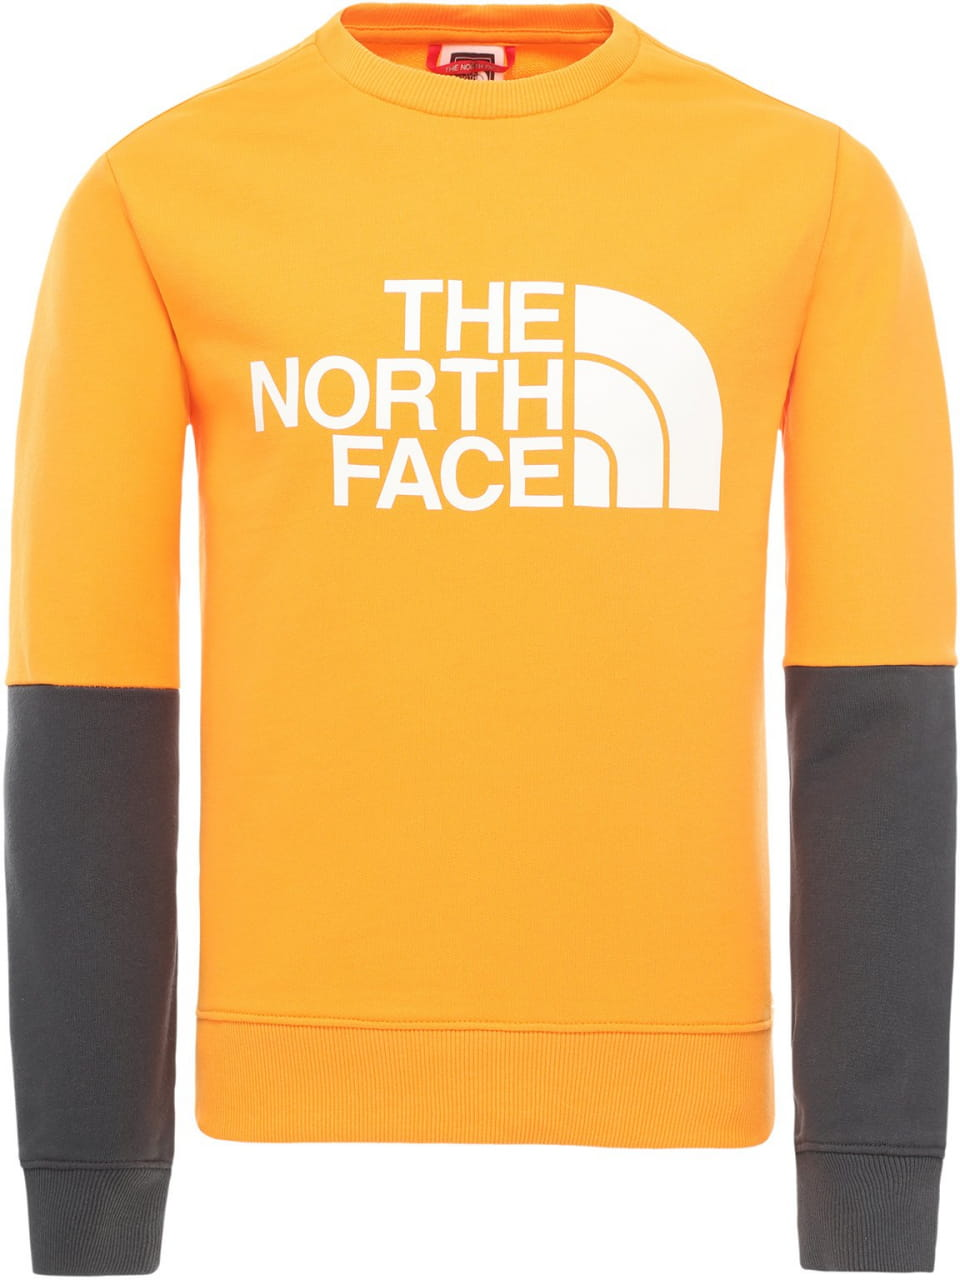 Sweatshirts The North Face Youth Drew Peak Light Pullover